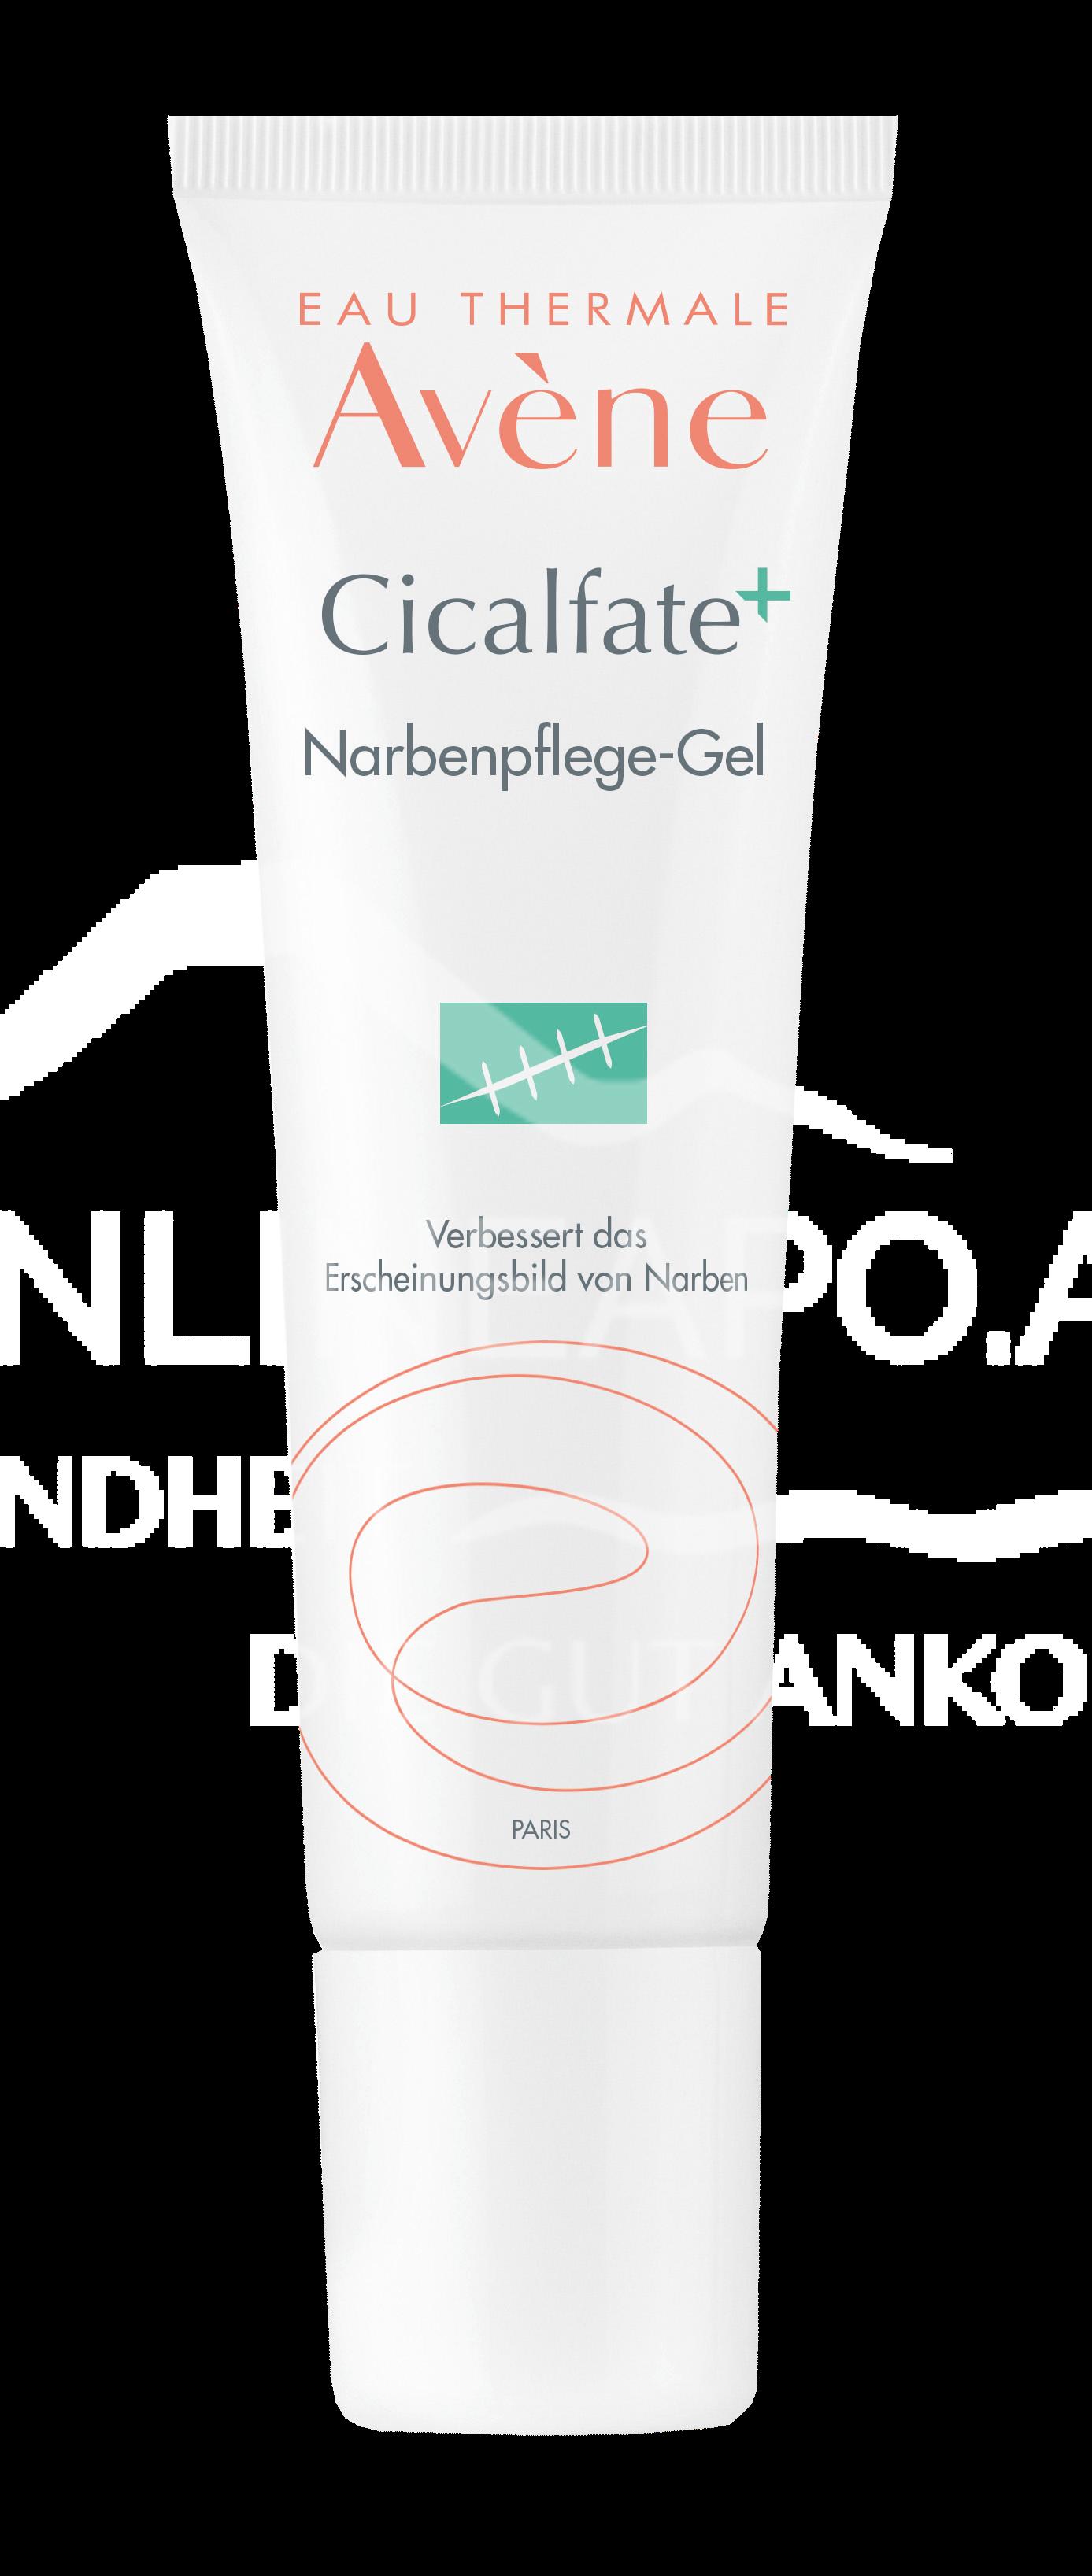 Avene Cicalfate+ Narbenpflege-Gel